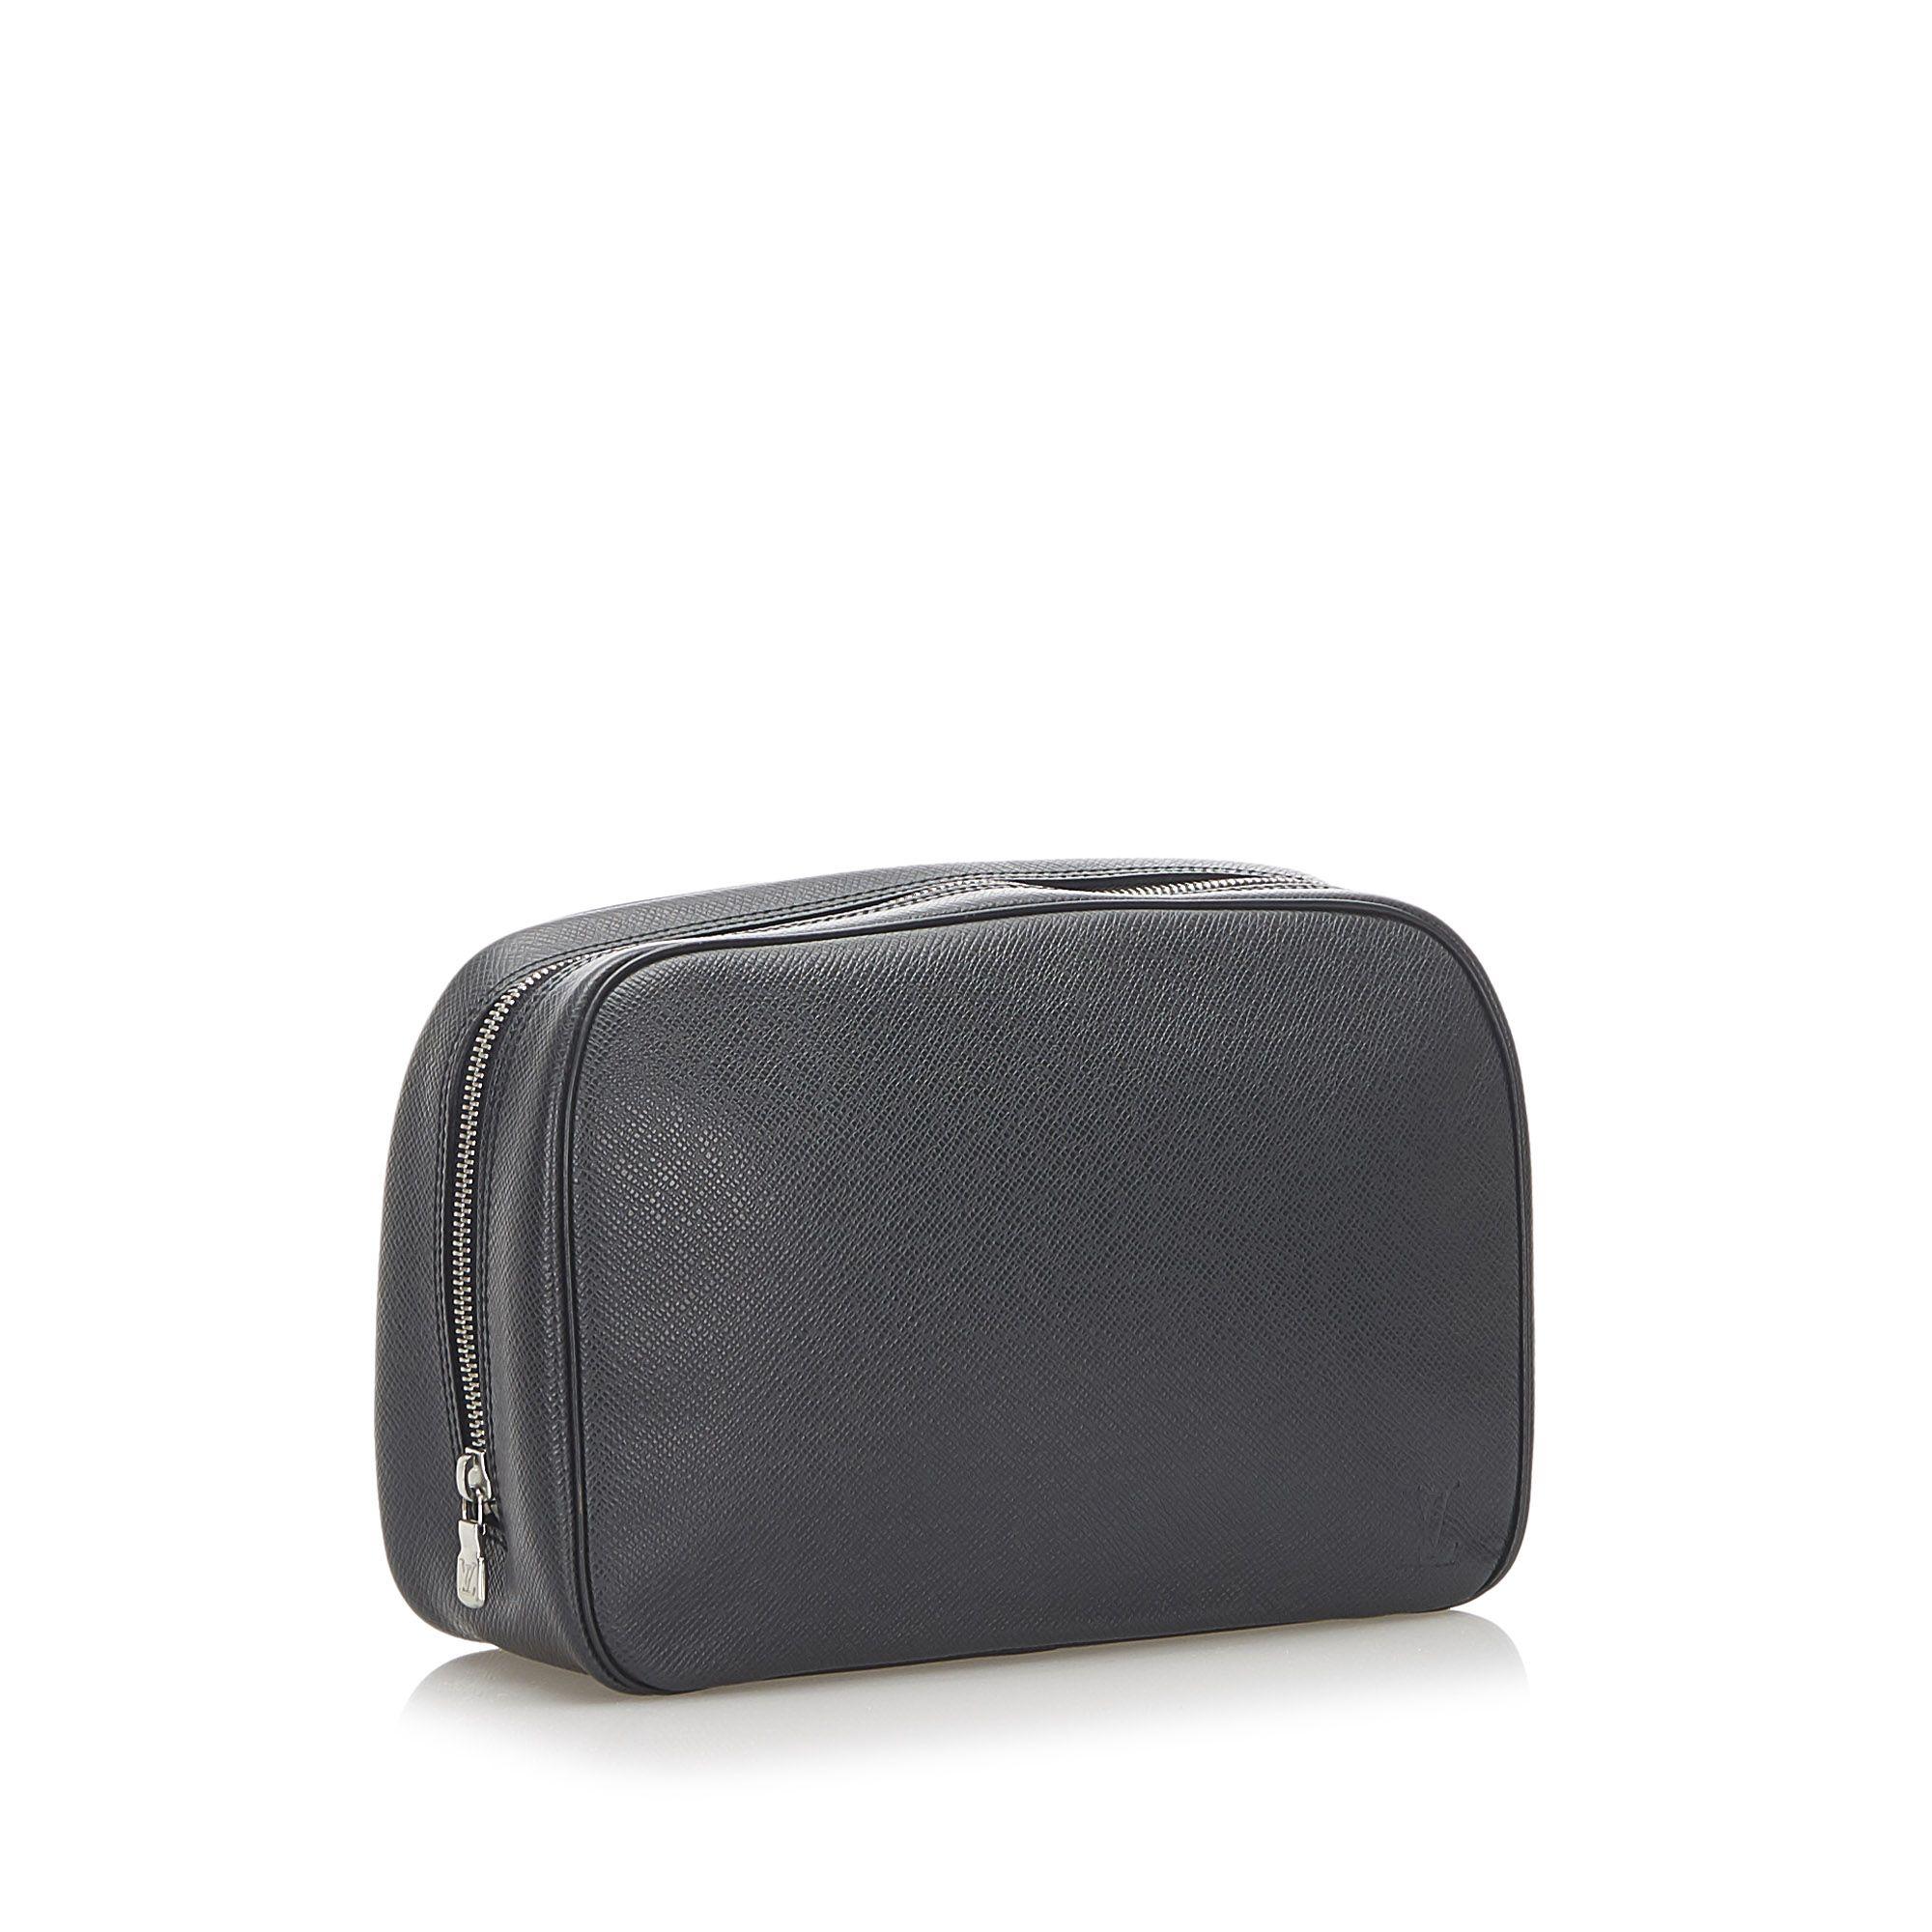 Vintage Louis Vuitton Taiga Toiletry Pouch GM Black